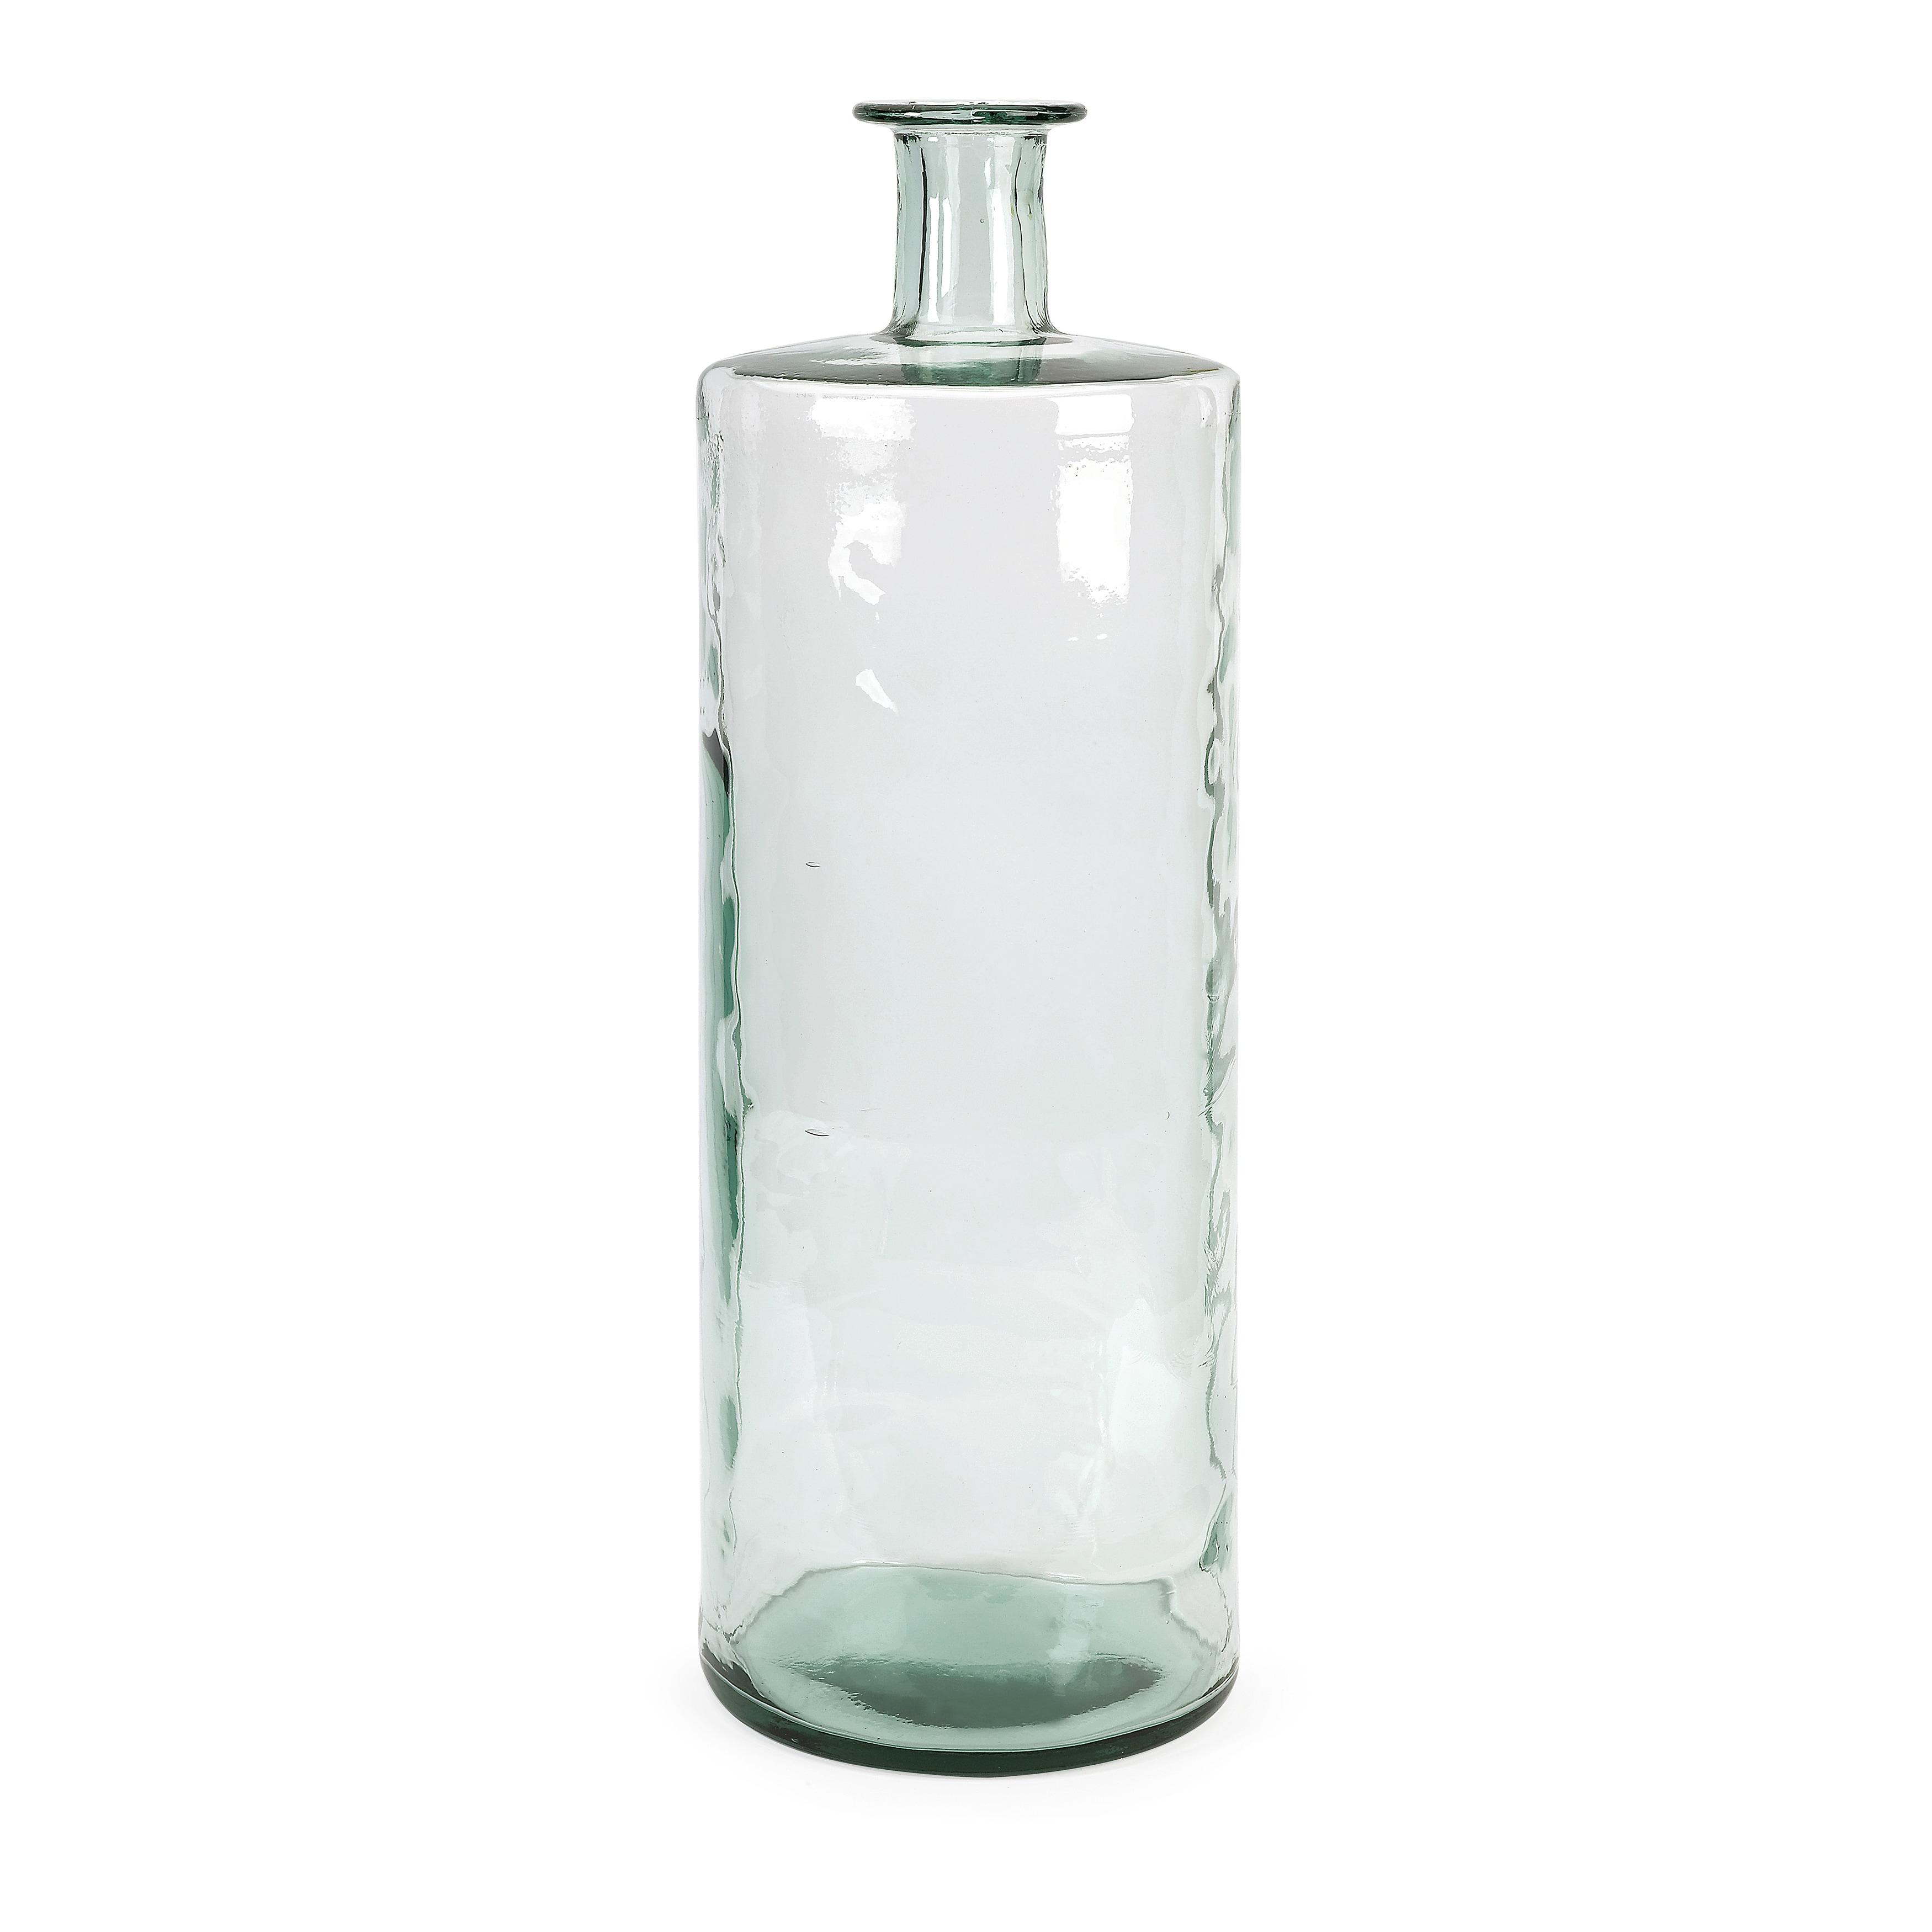 Vettriano oversized tall recycled glass vase free shipping today vettriano oversized tall recycled glass vase free shipping today overstock 17293522 reviewsmspy